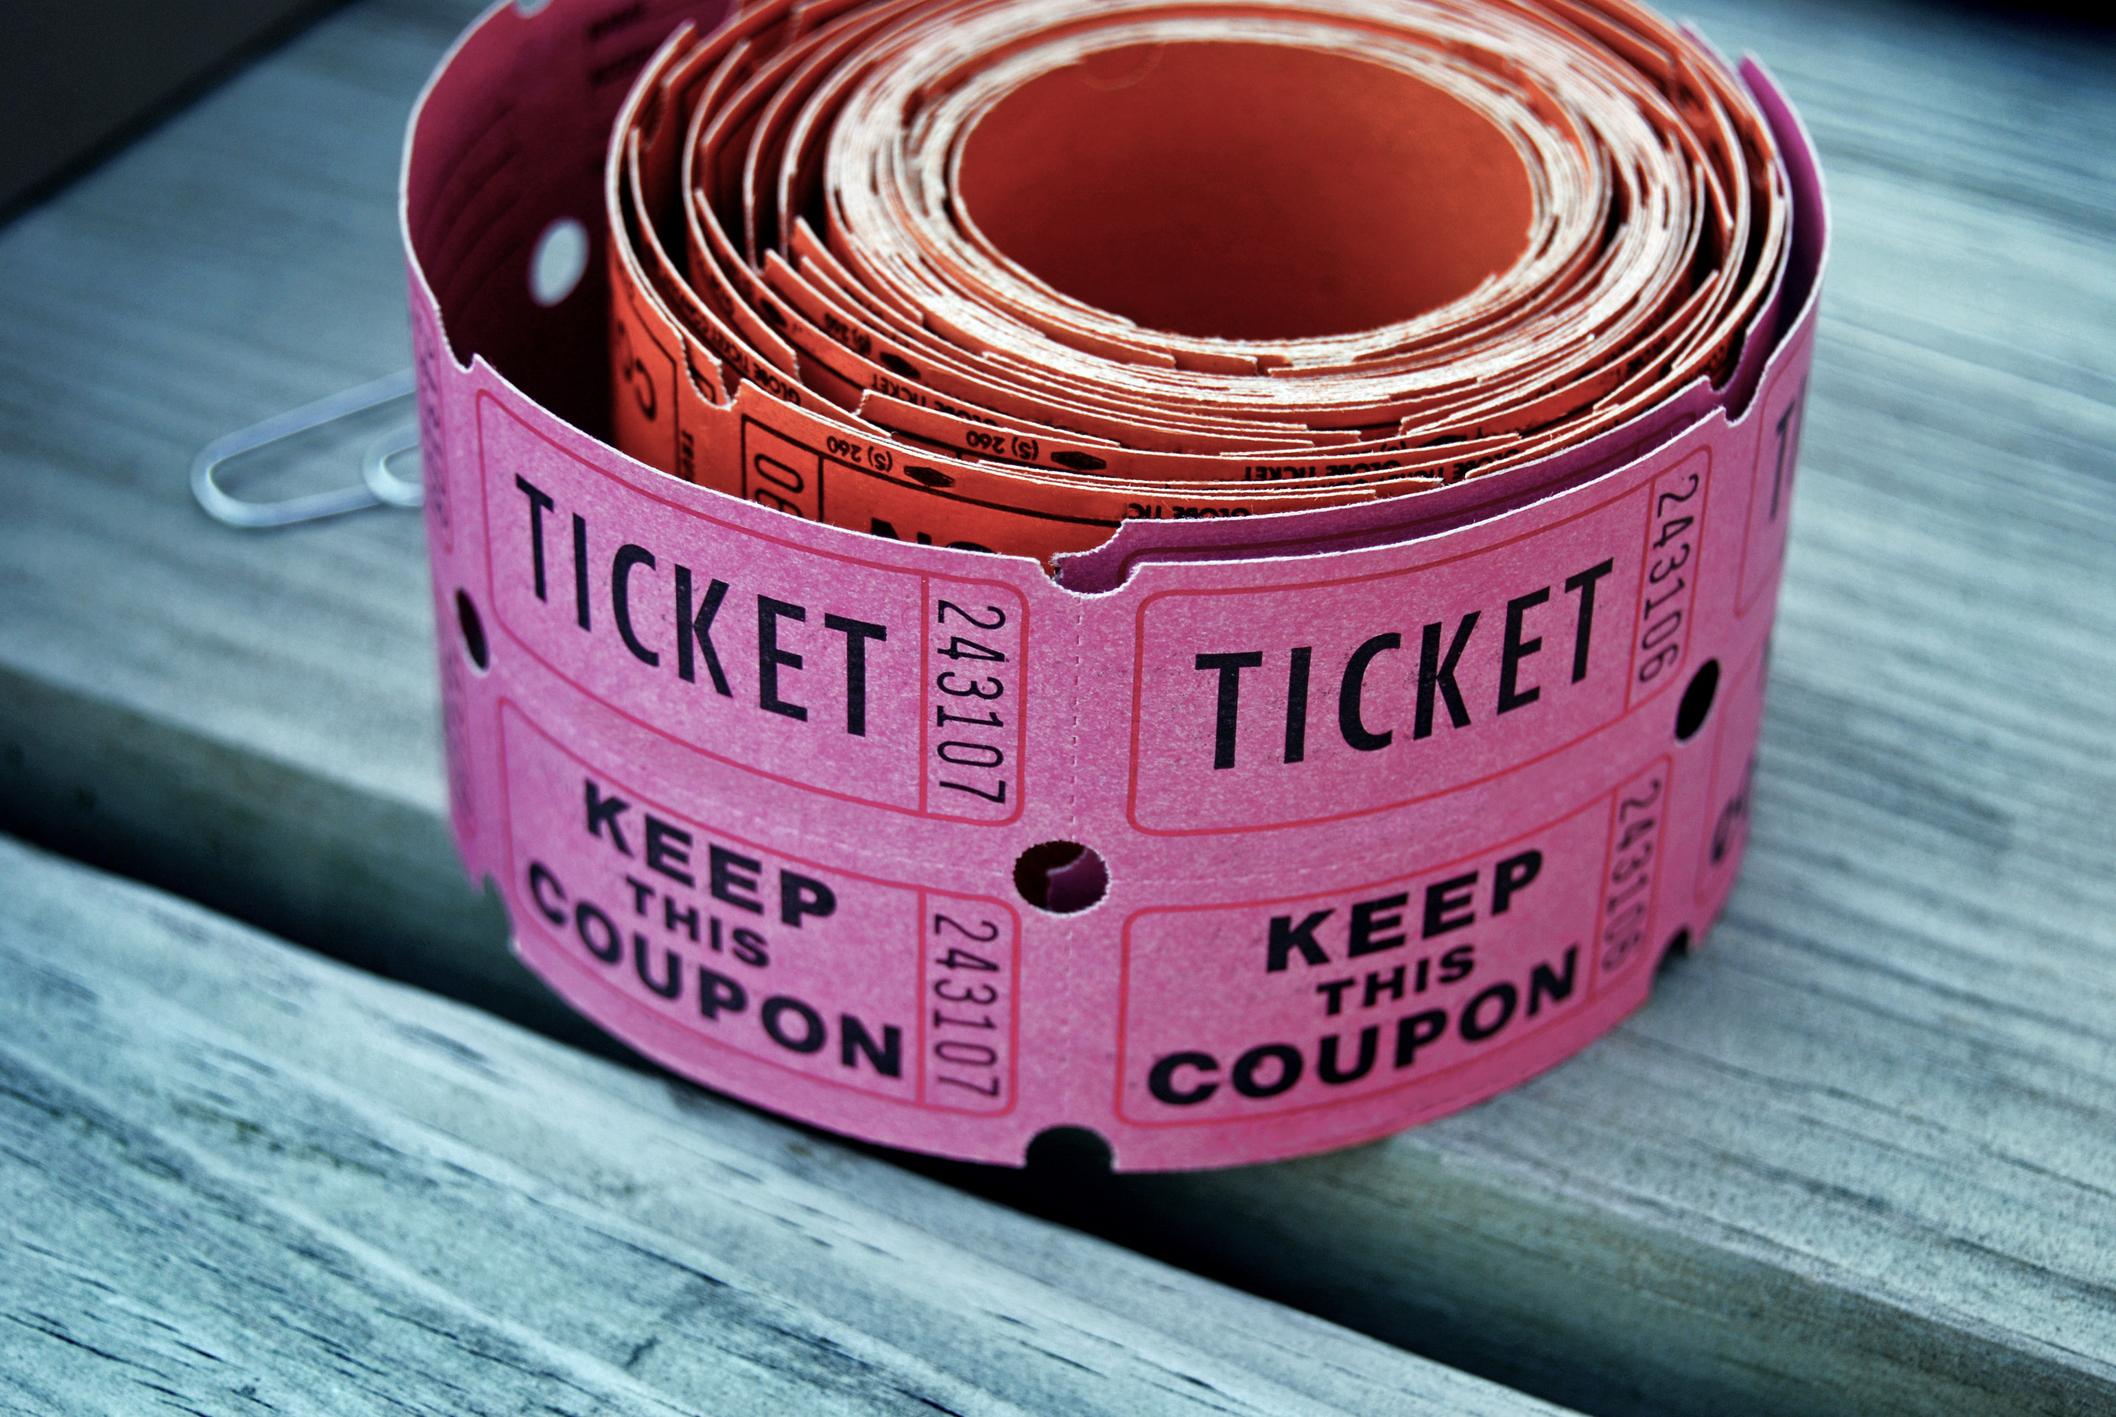 selling raffle tickets